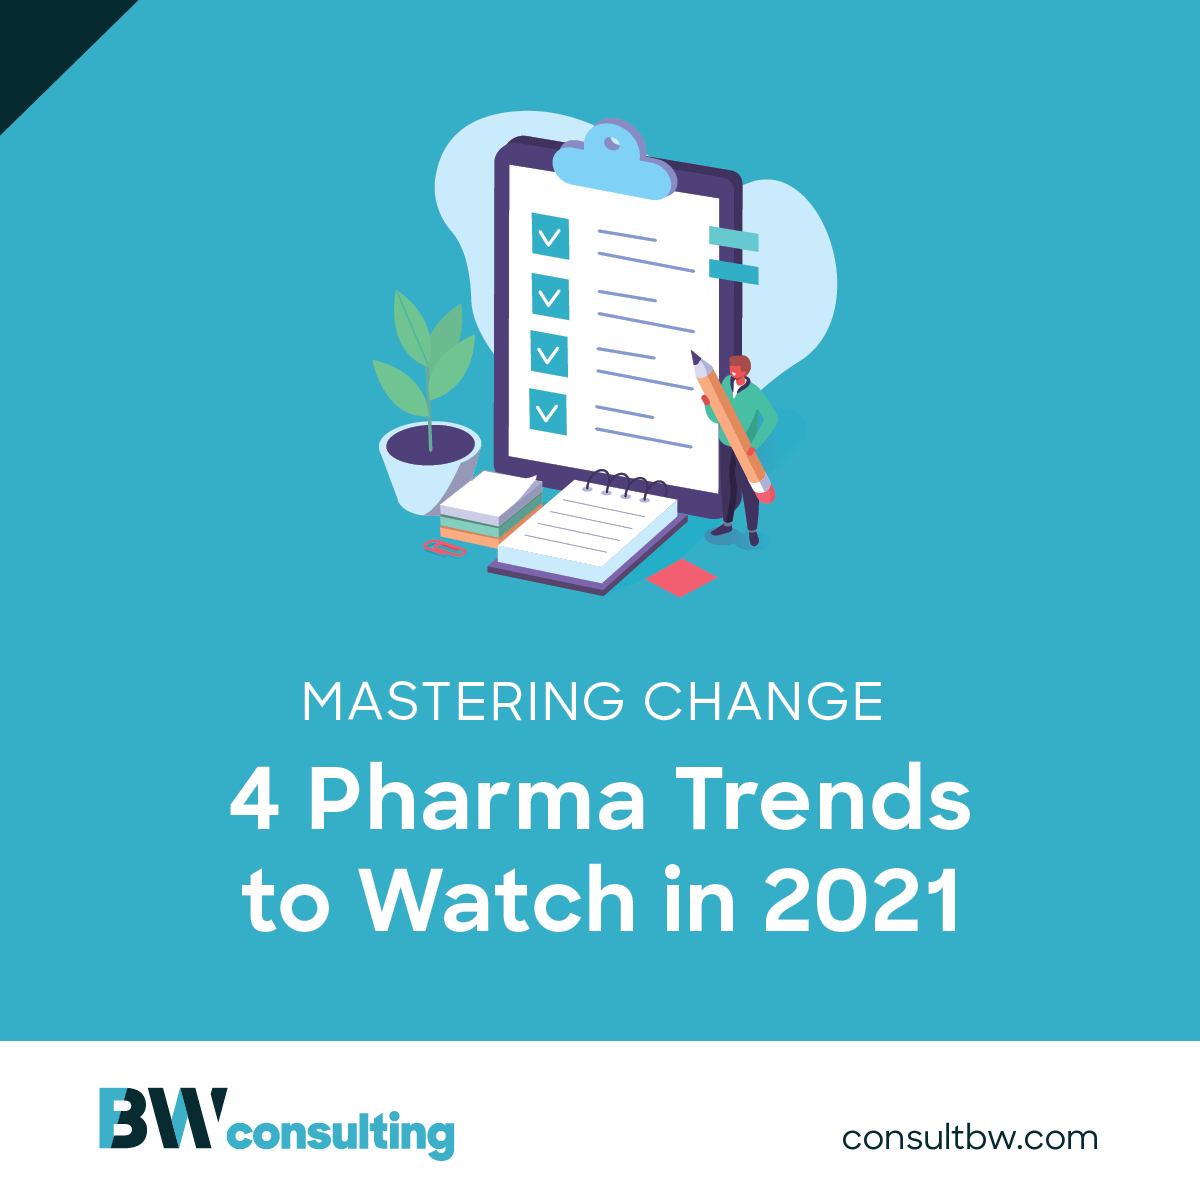 4 Pharma Trends to Watch